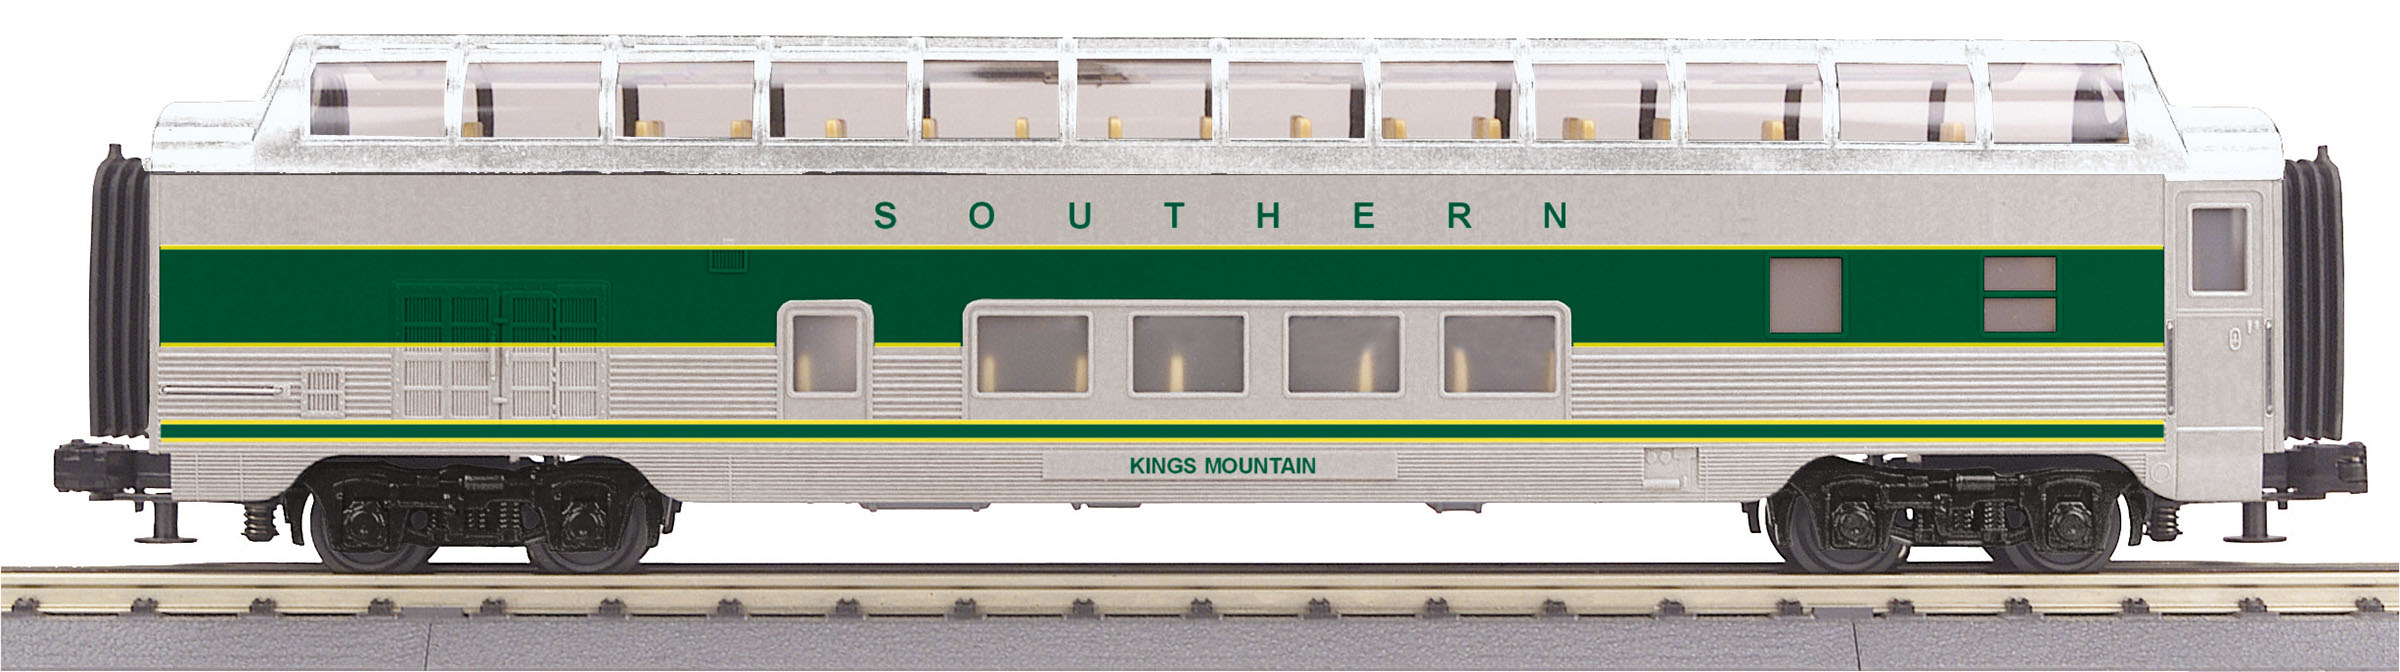 MTH 30-68163 60' Full Length Vista Dome 3 Rail RailKing Southern Railway